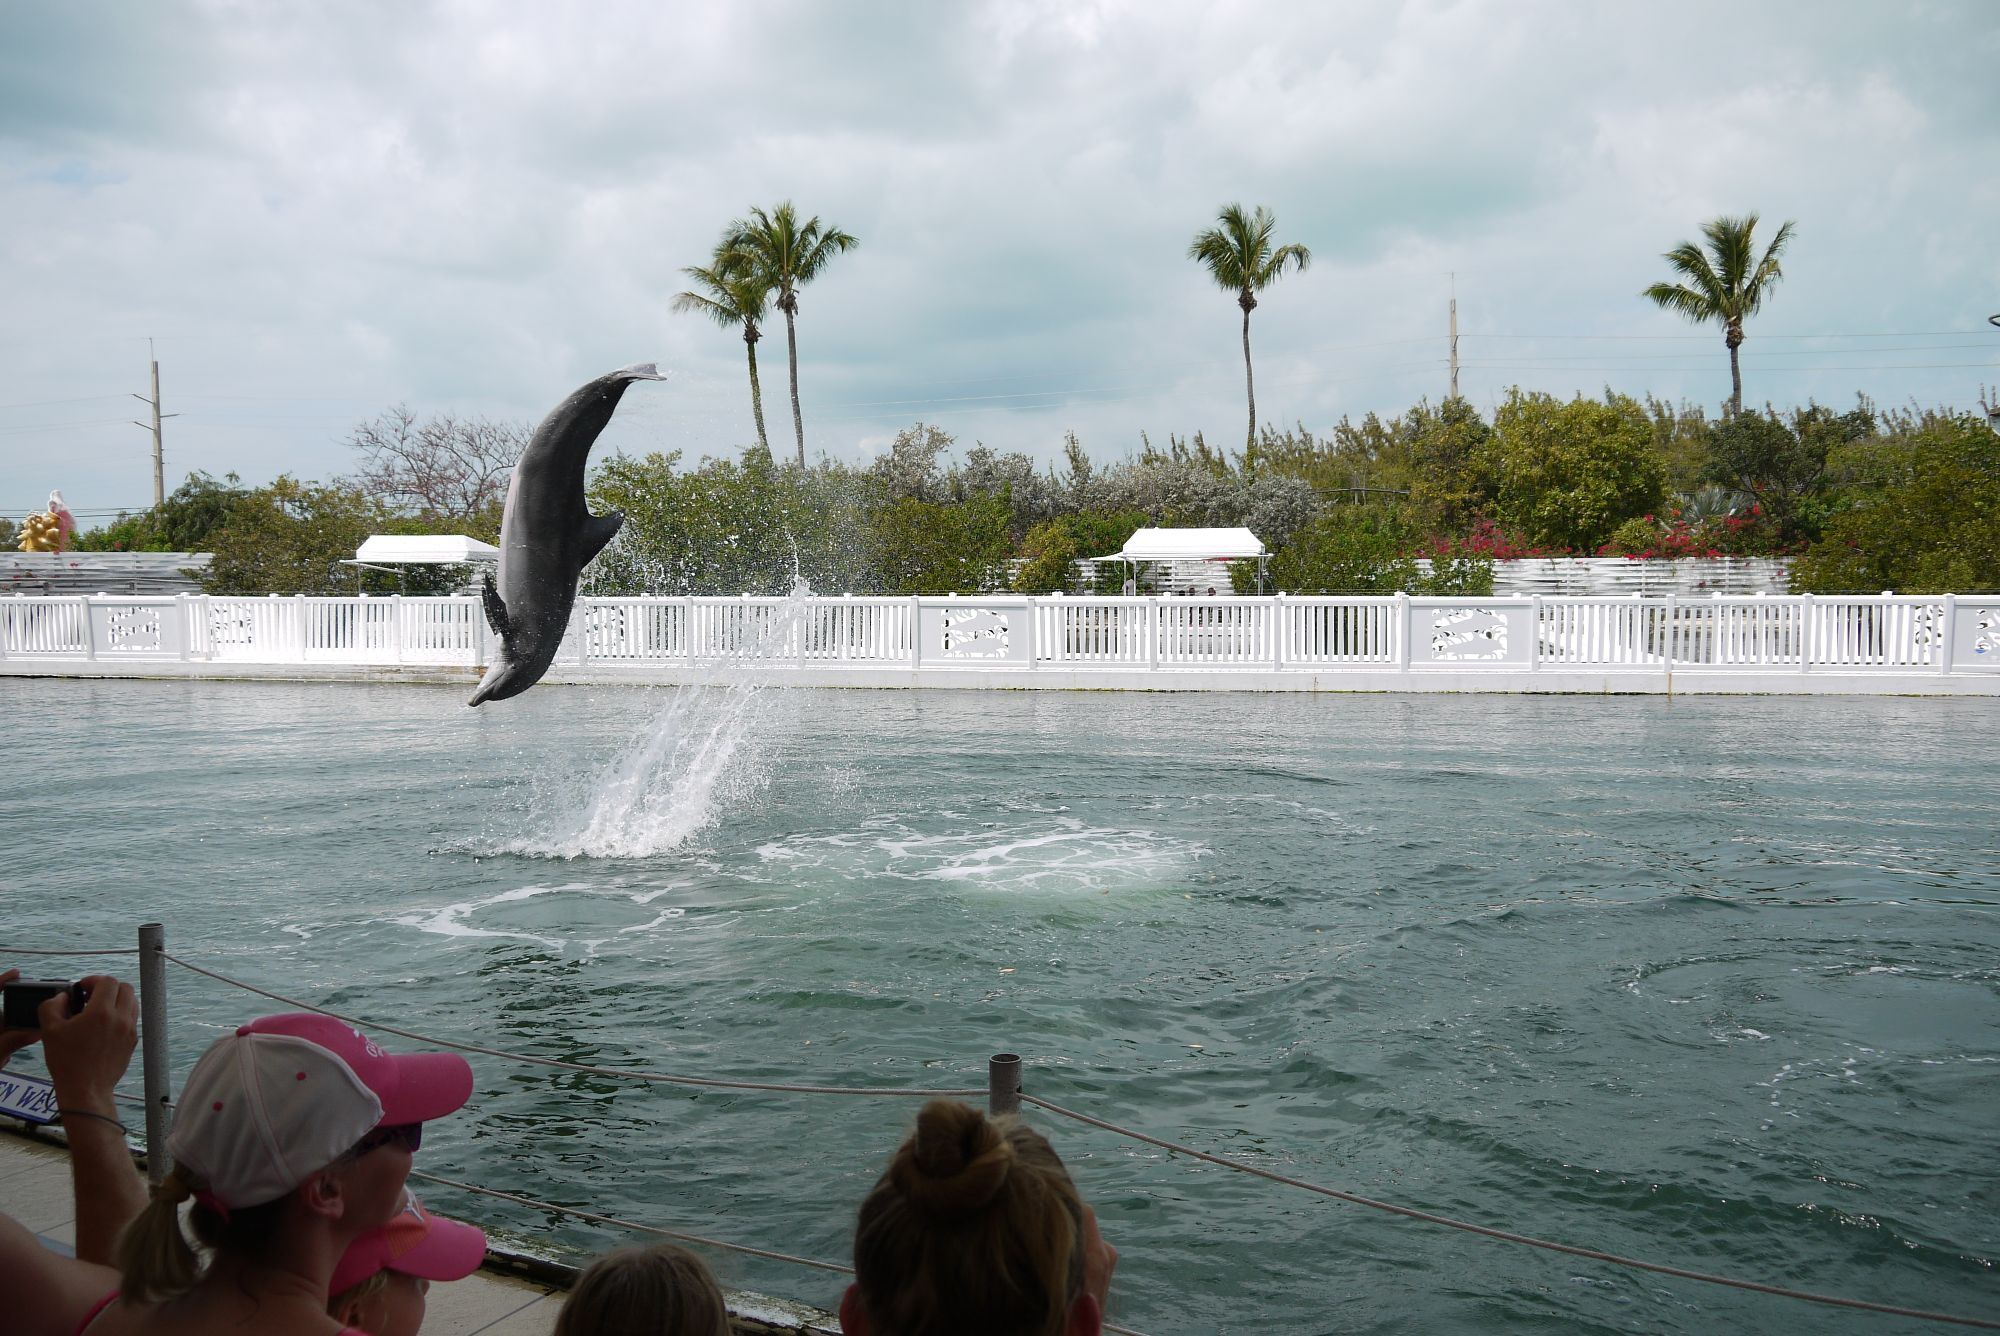 Theater of the Sea, Overseas Hwy, Islamorada, FL 33036, Florida Keys